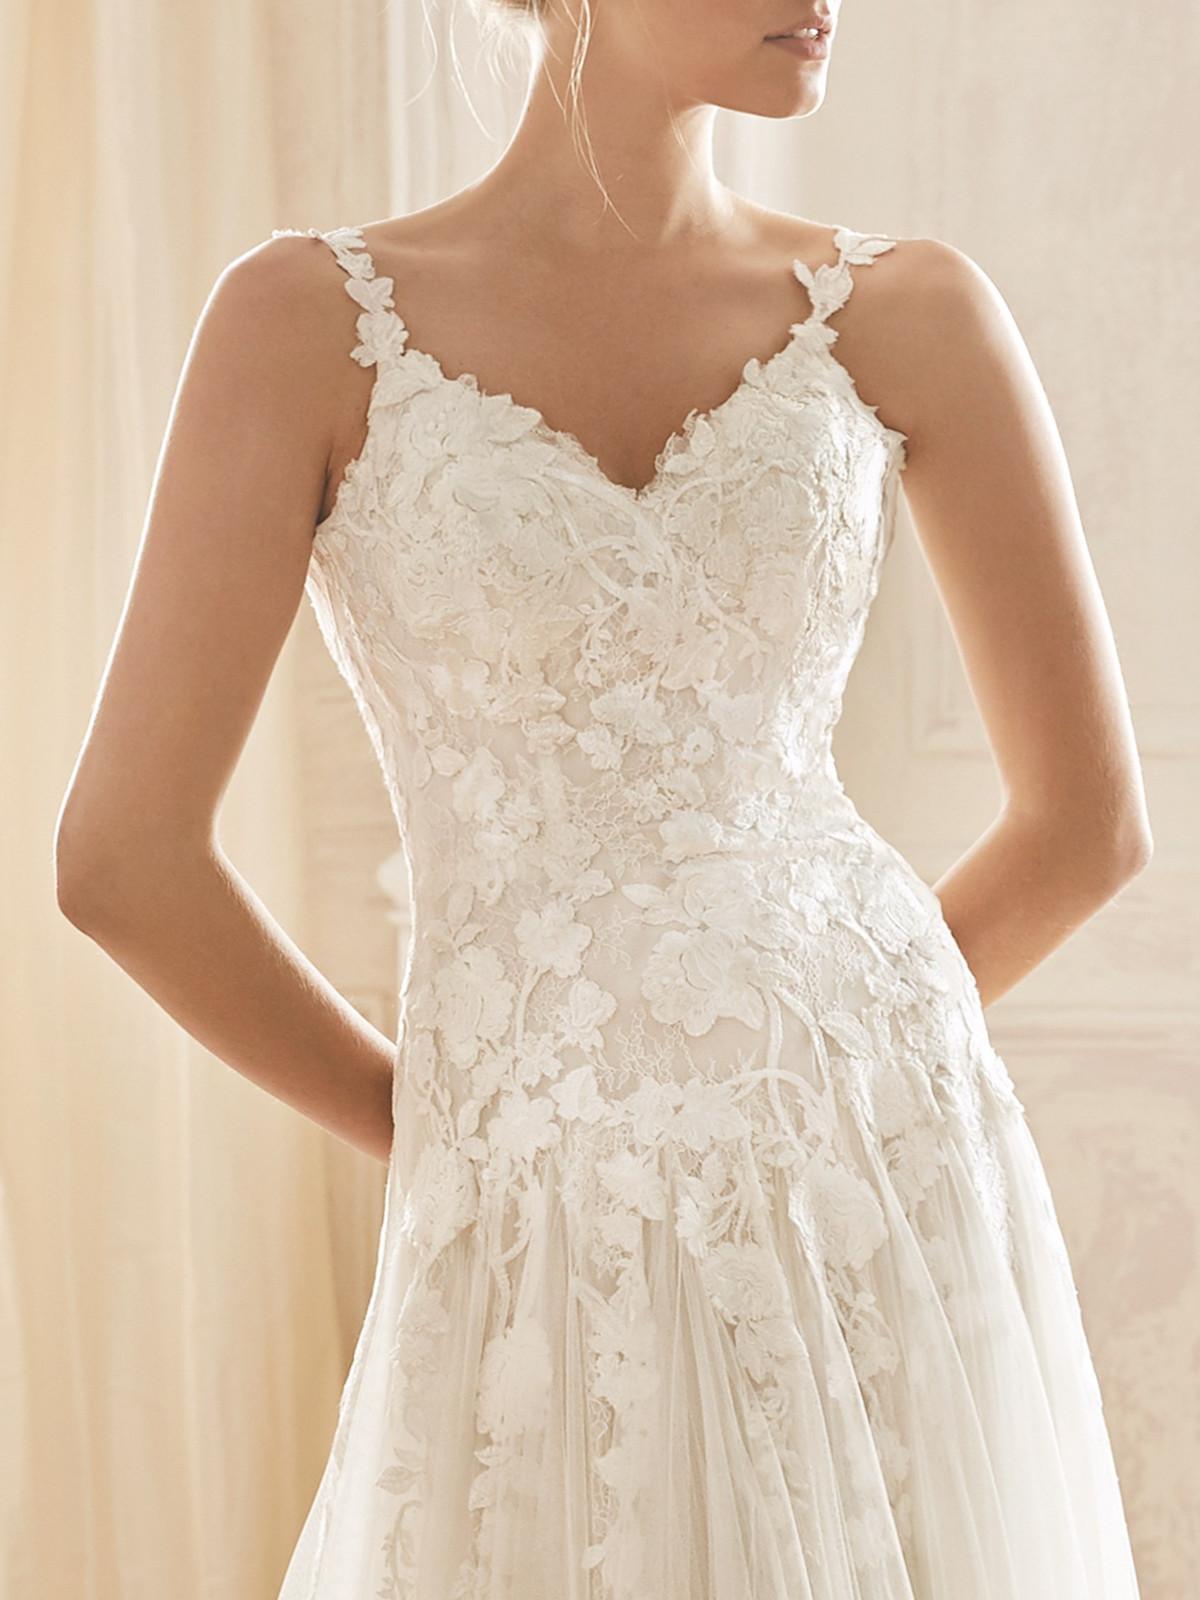 vestido de noiva, aluguel de vestidos, noiva, noivas rio, vestidos, dress, bride, rio de janeiro, casamento, rio de janeiro, wedding destination, wedding, noivos, altar, Copacabana